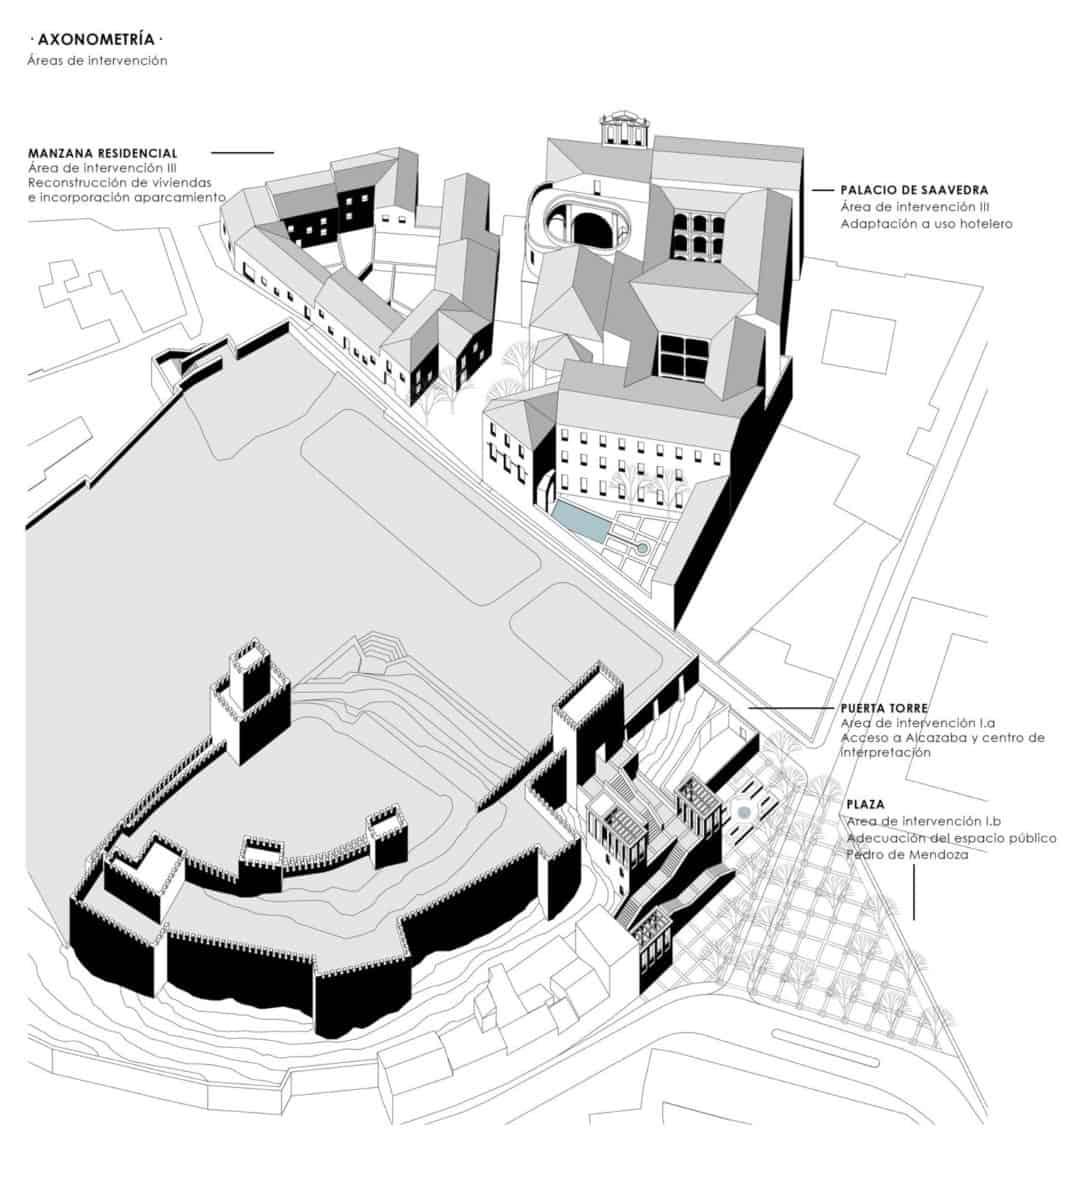 JIMENEZ&LINARES_DRIEHAUS GUADIX_Axonometría urbana